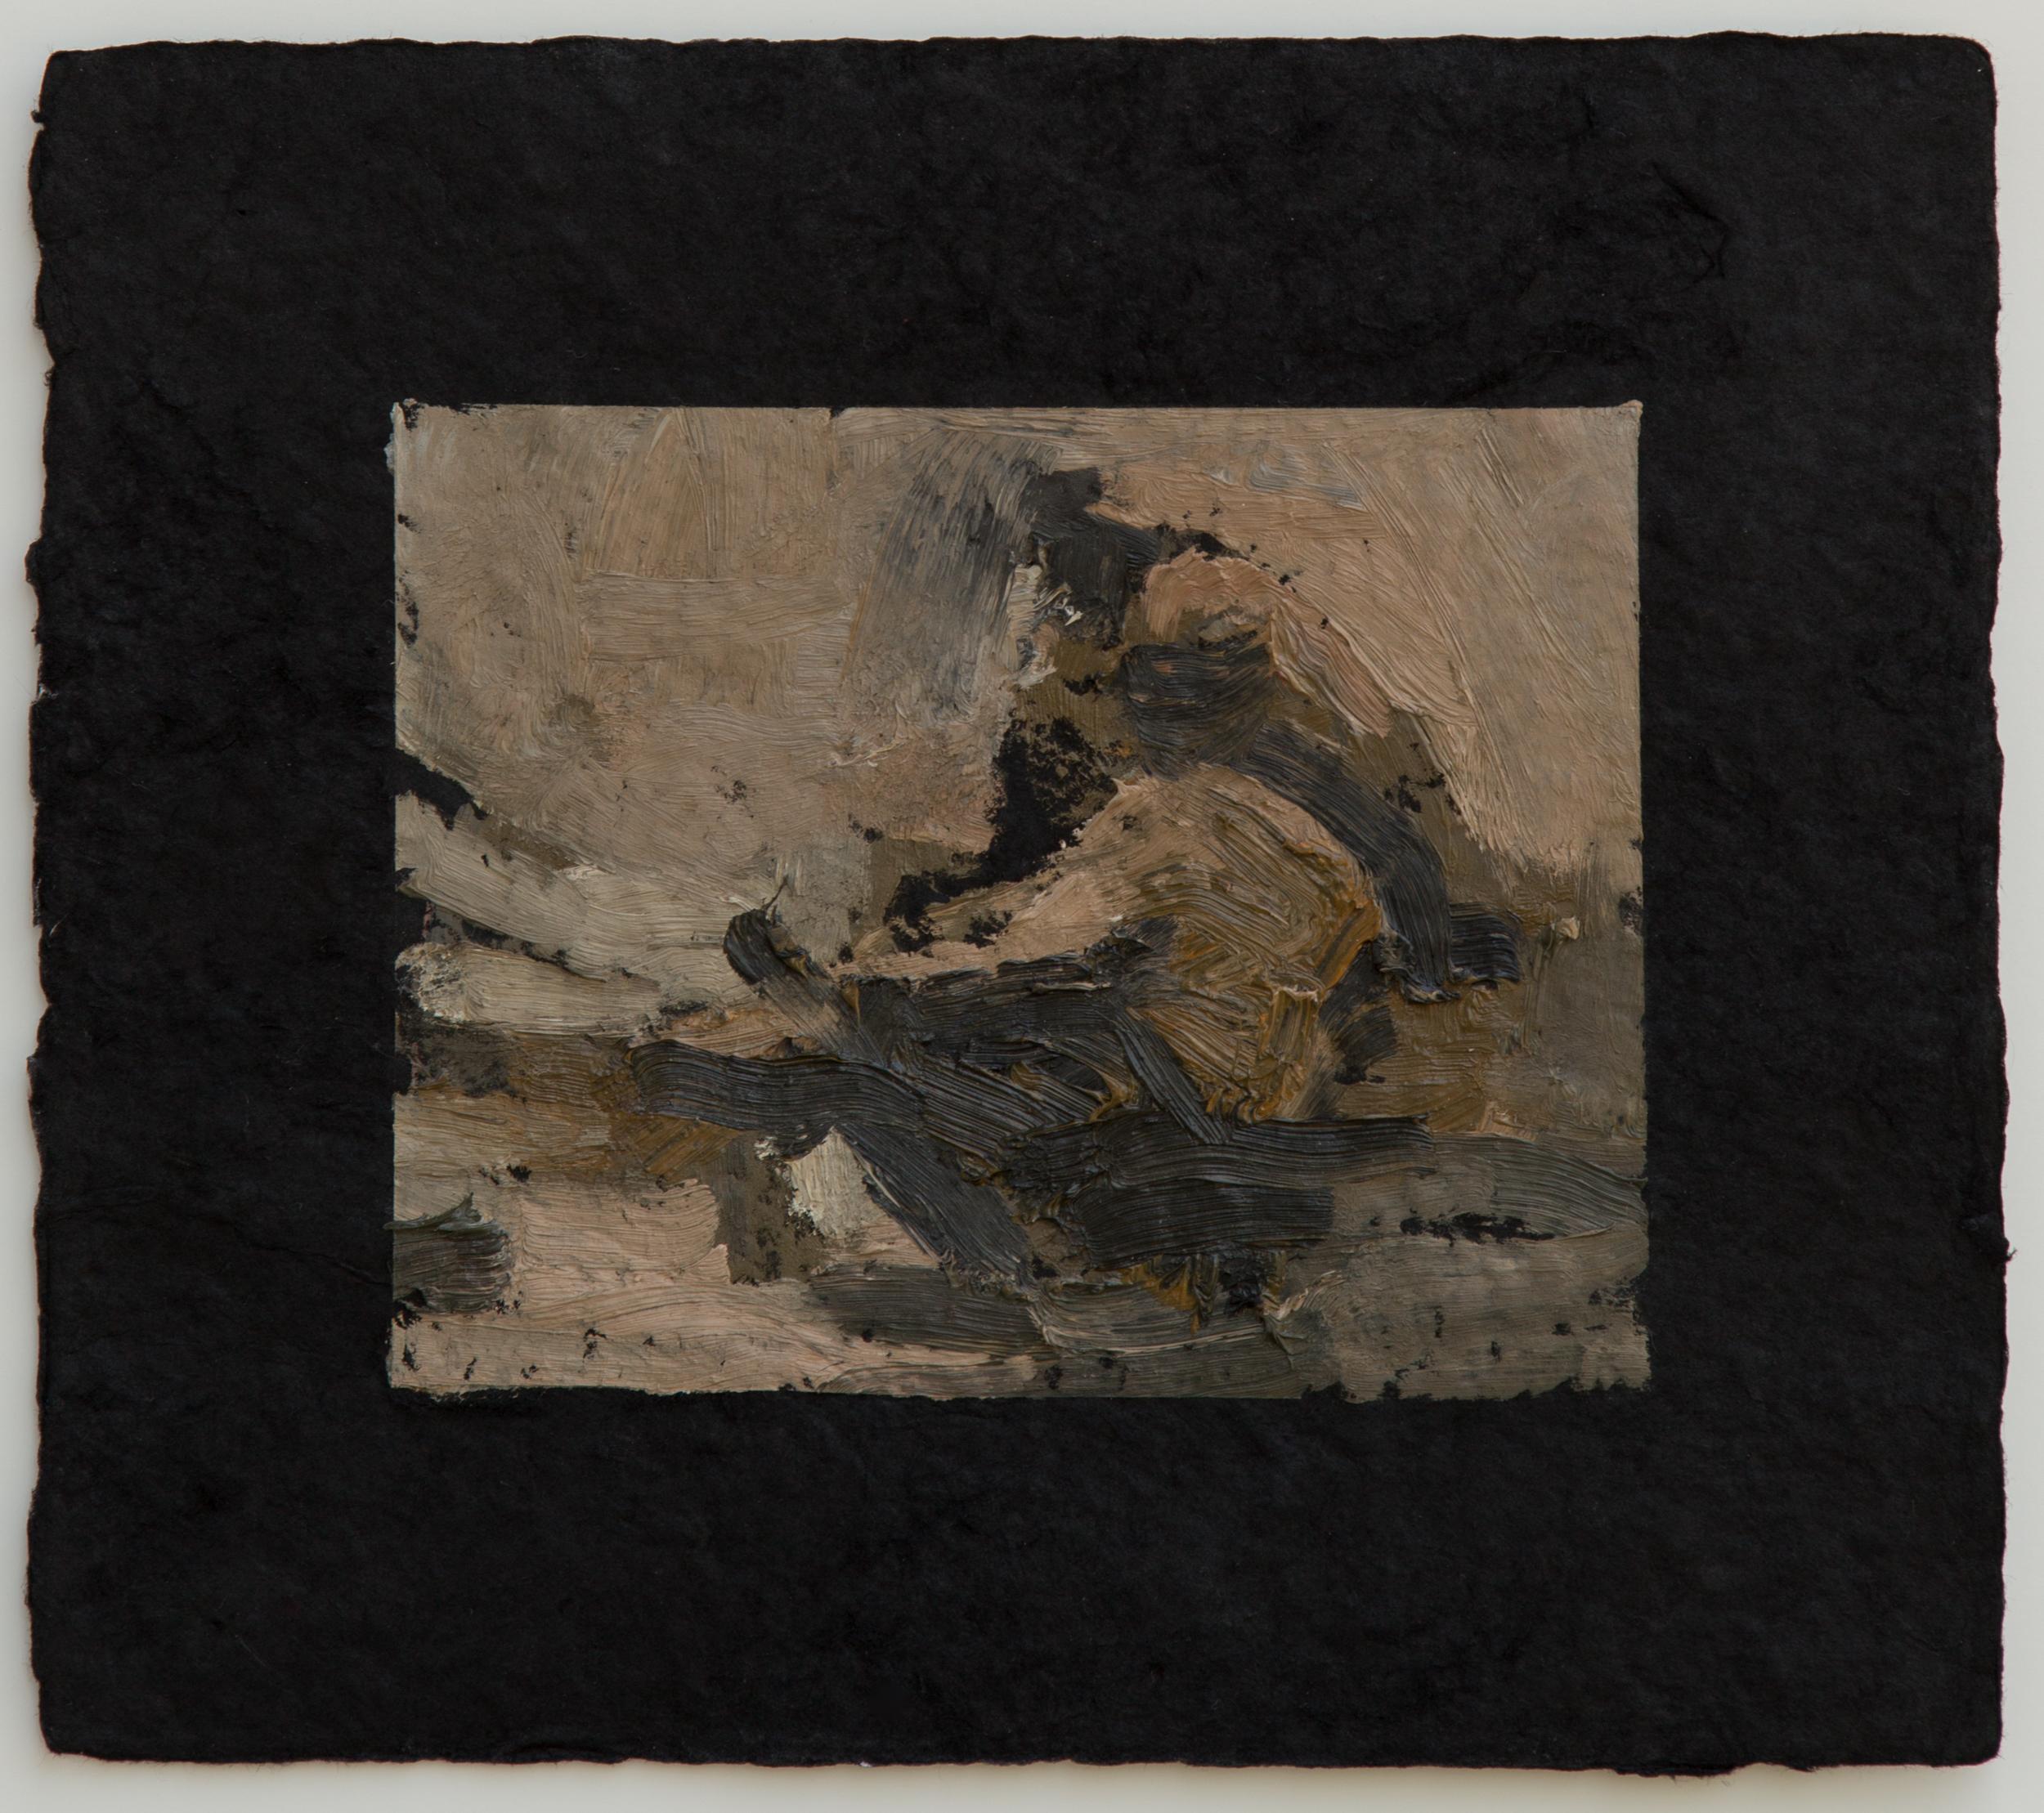 "Campfire study II, 9 x 10"", 2016"